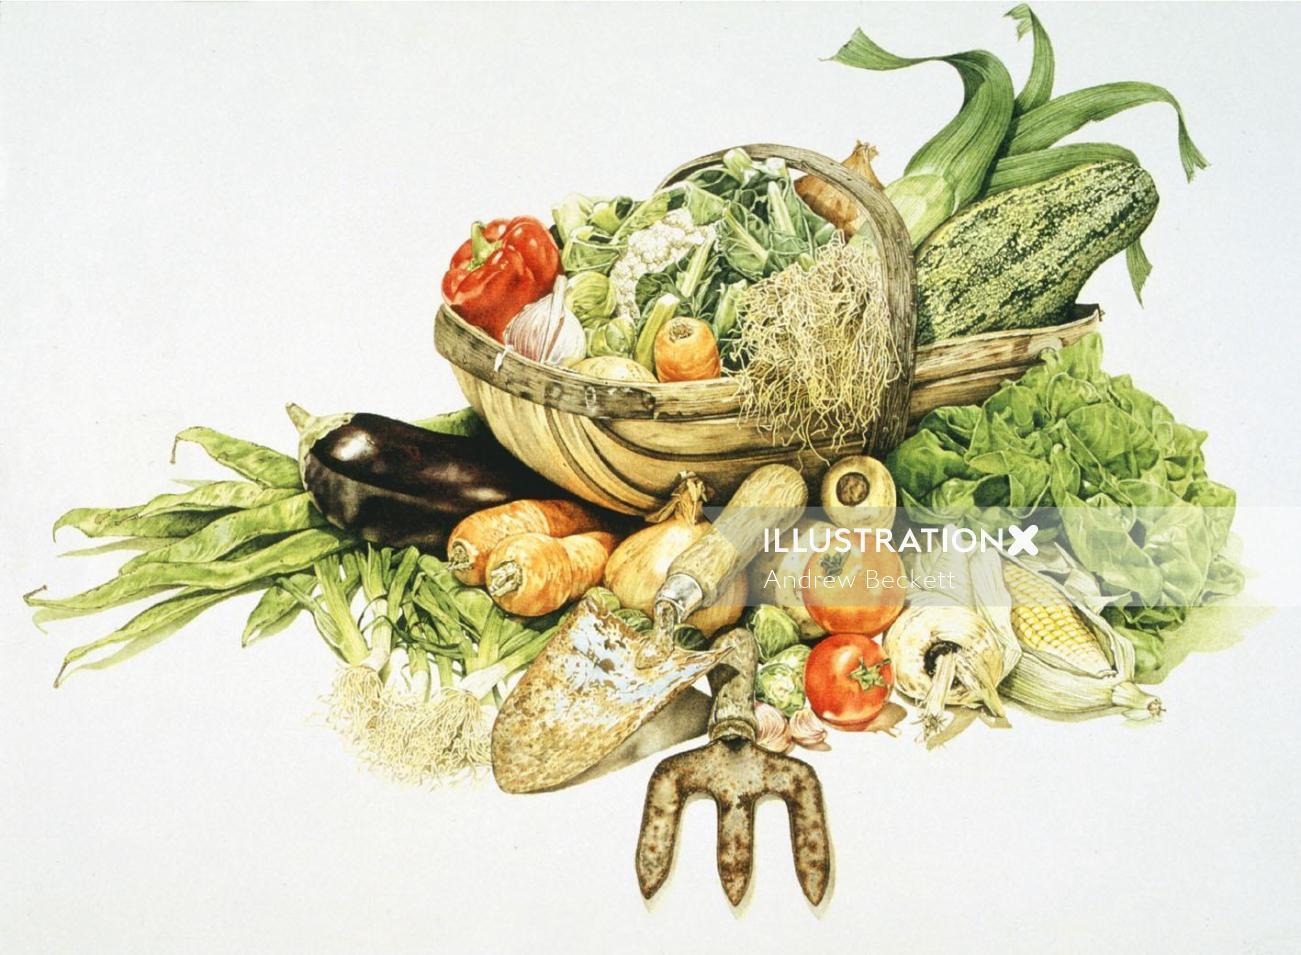 Graphical illustration of vegetabuls